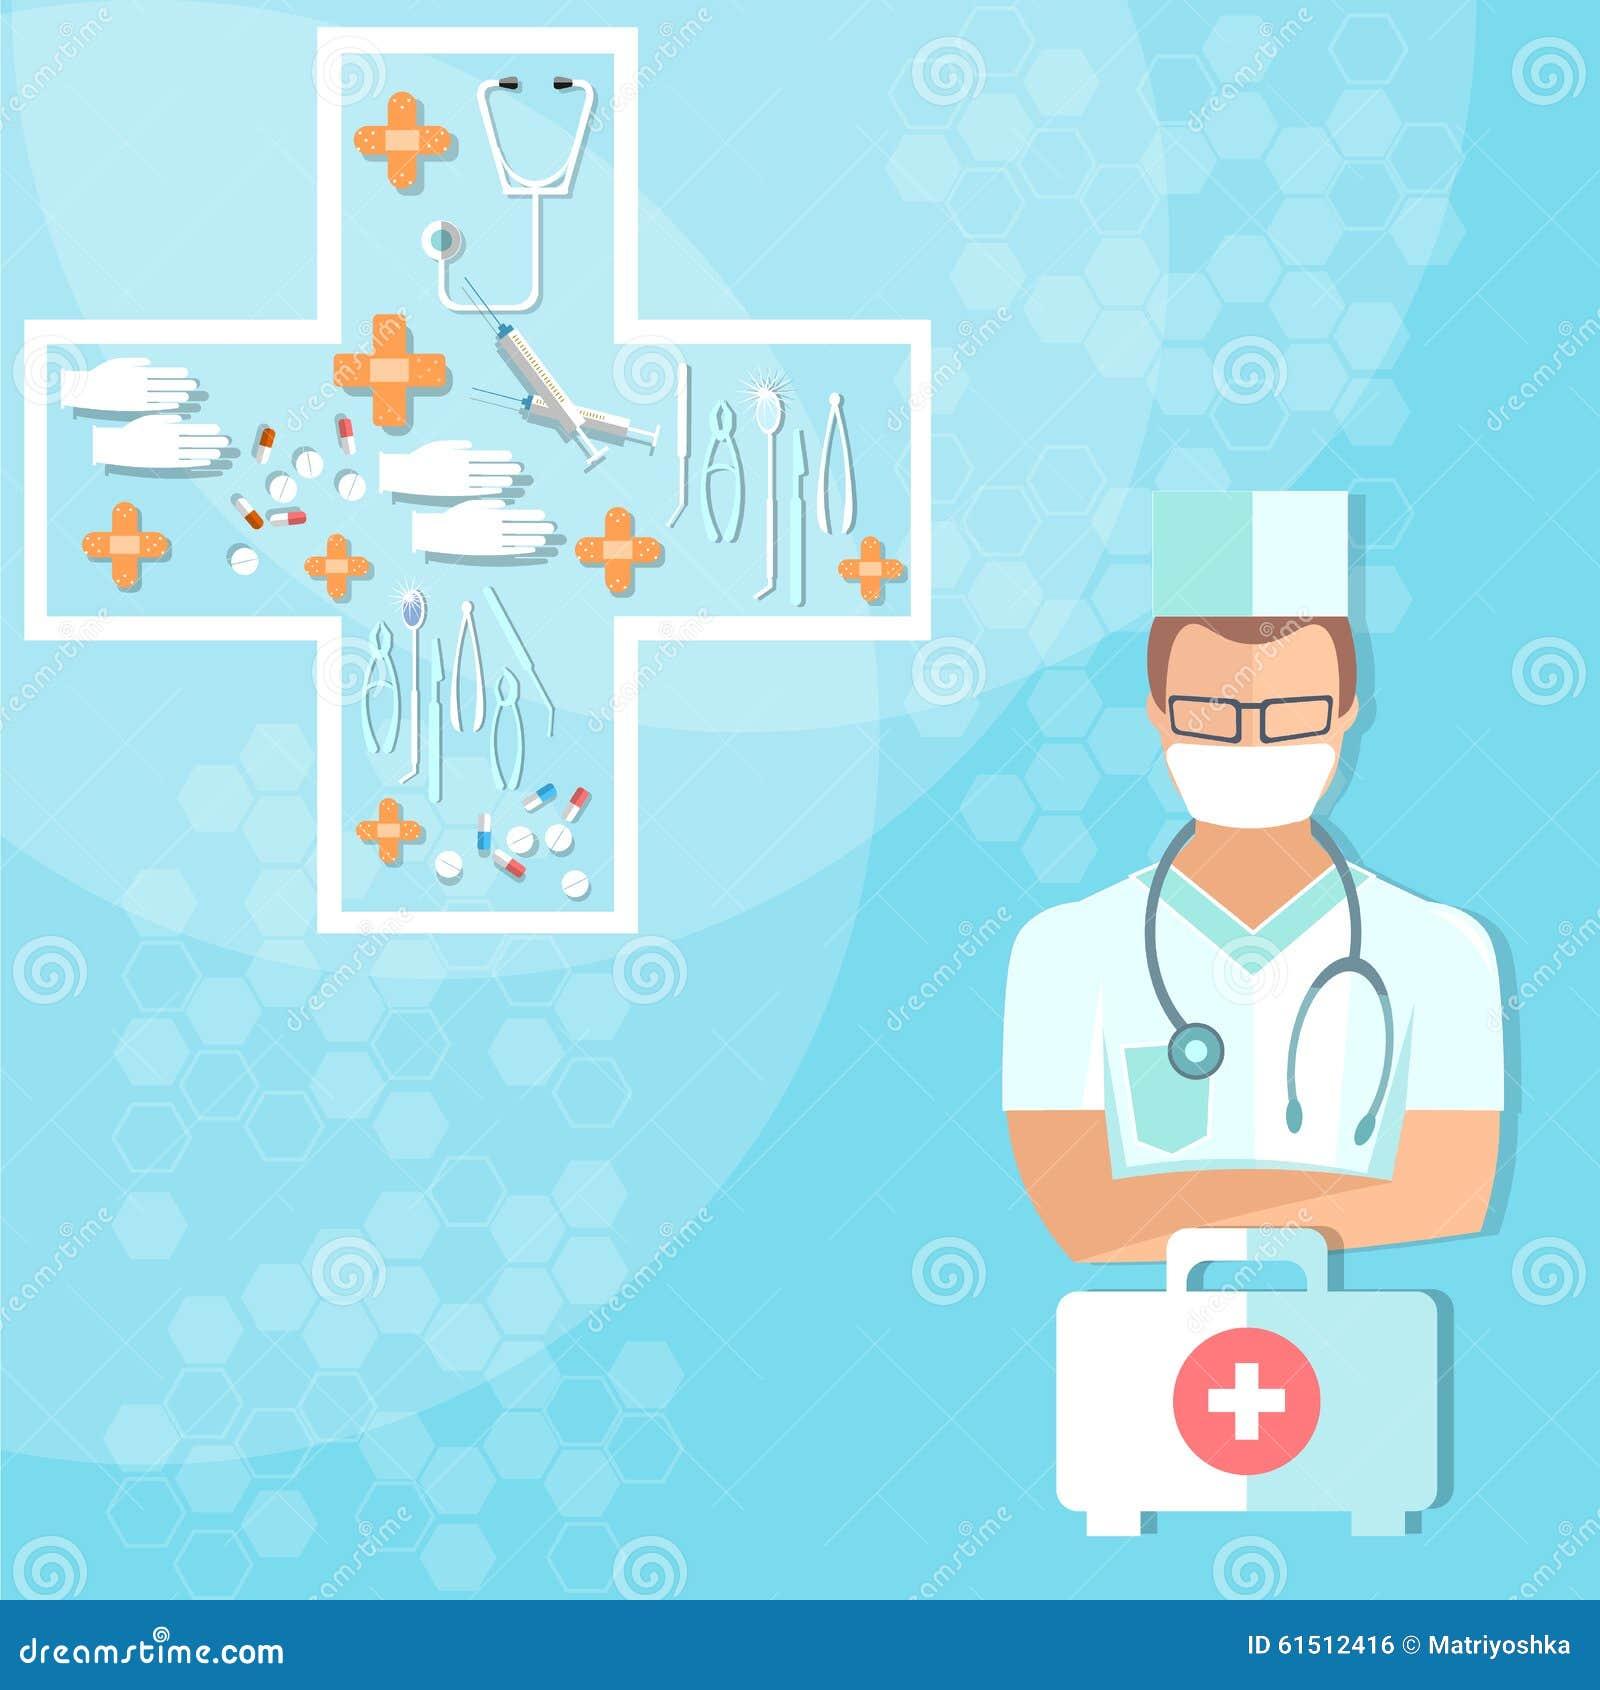 Доктор с здравоохранением стетоскопа и объектами медицины медицинскими